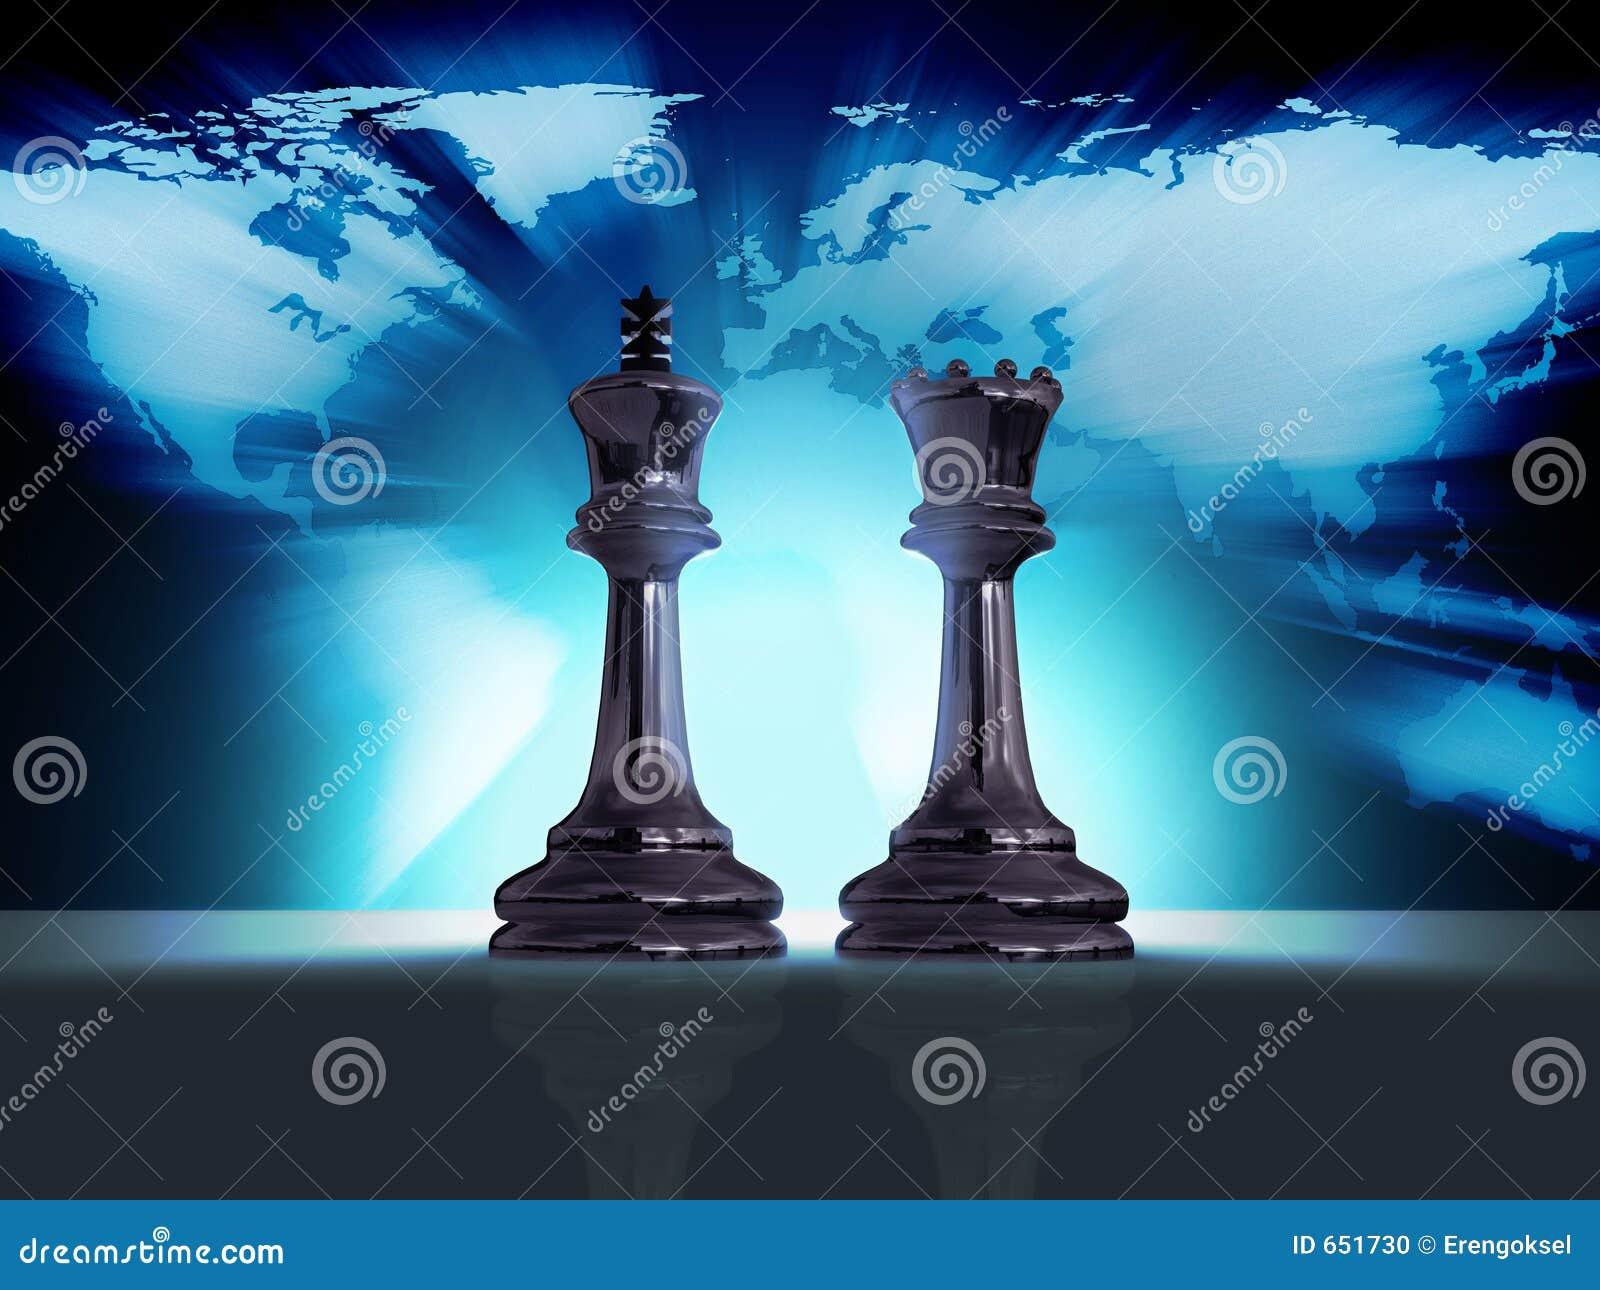 Chess world stock illustration. Illustration of abstract ...